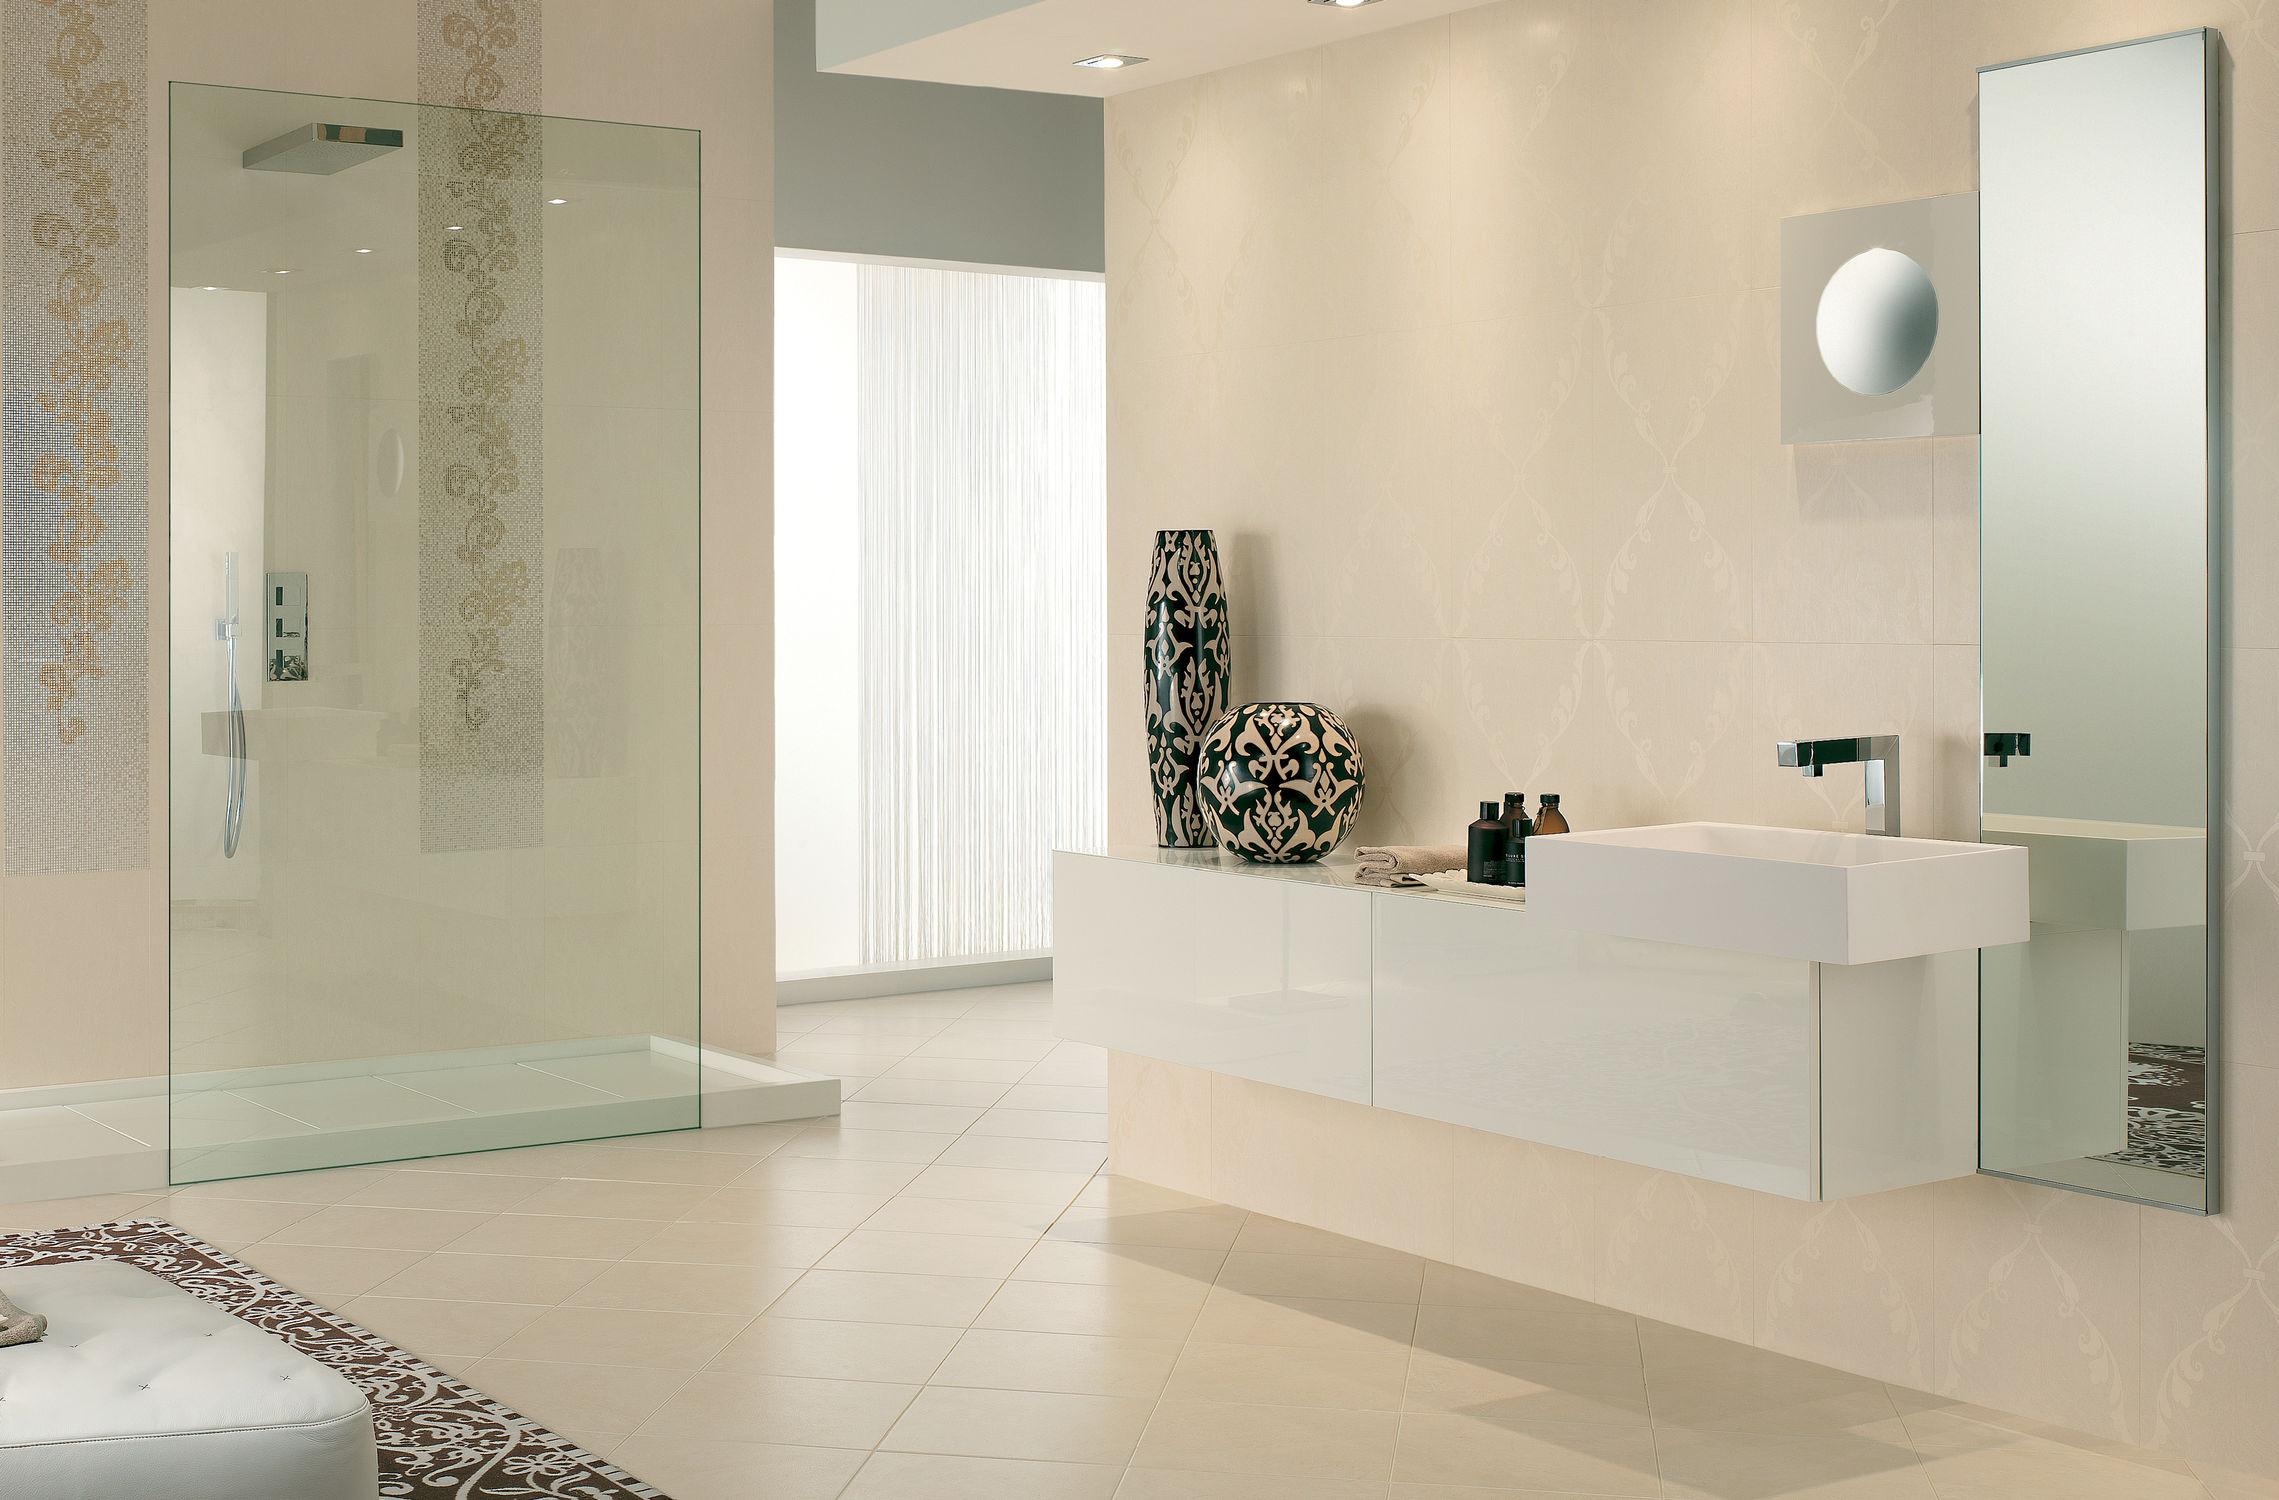 piastrella-bagno-murale-ceramica-damasco-58266-1572401